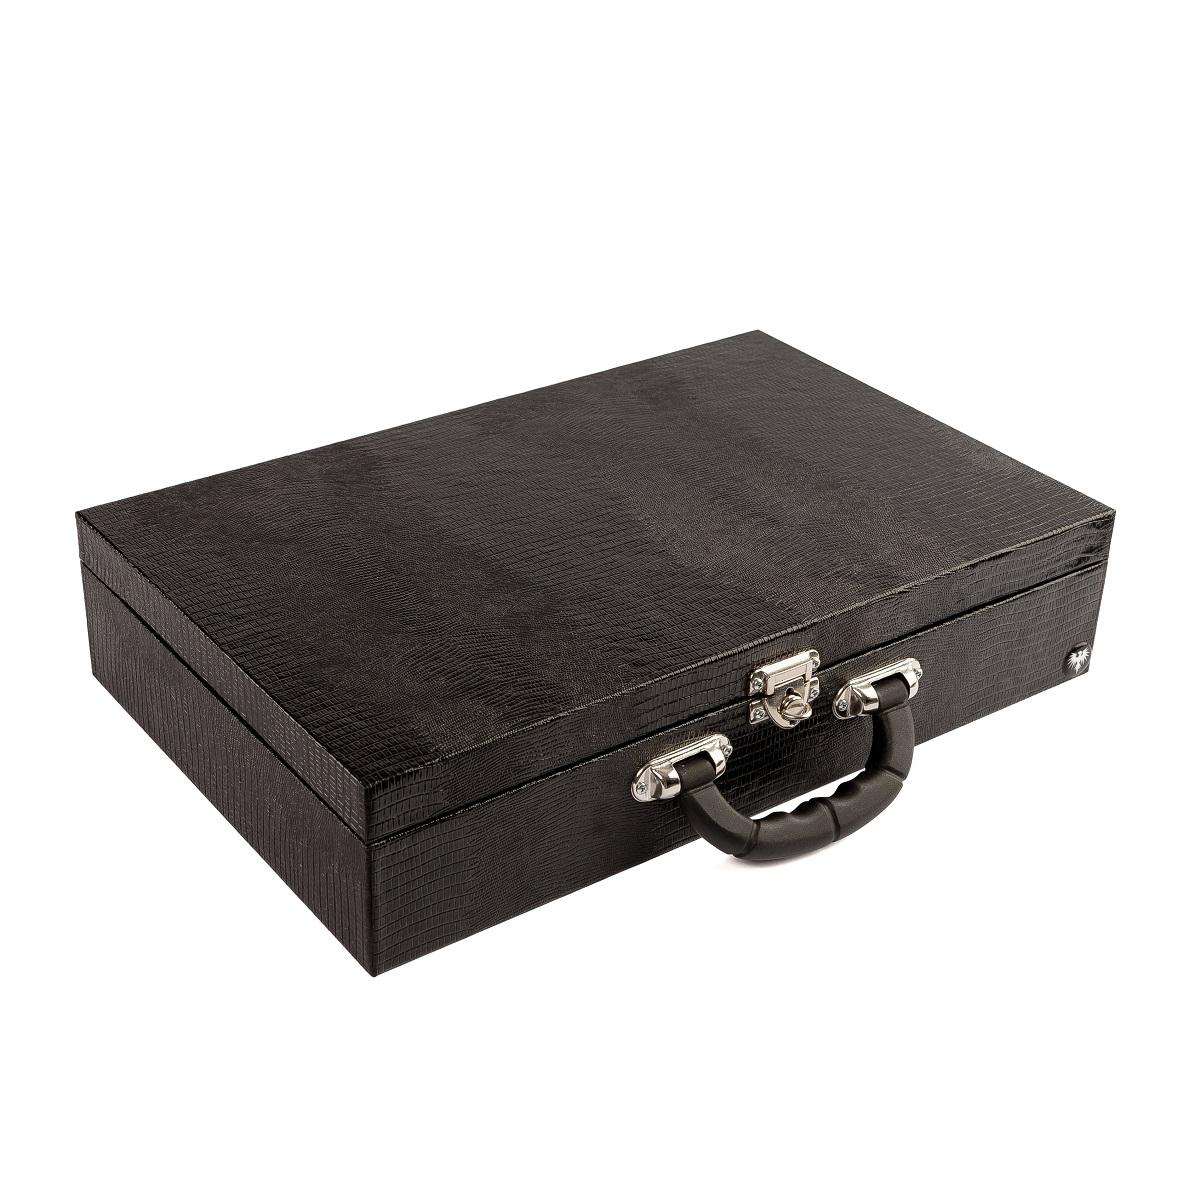 maleta-porta-relogio-21-nichos-couro-ecologico-preto-bege-imagem-6.jpg